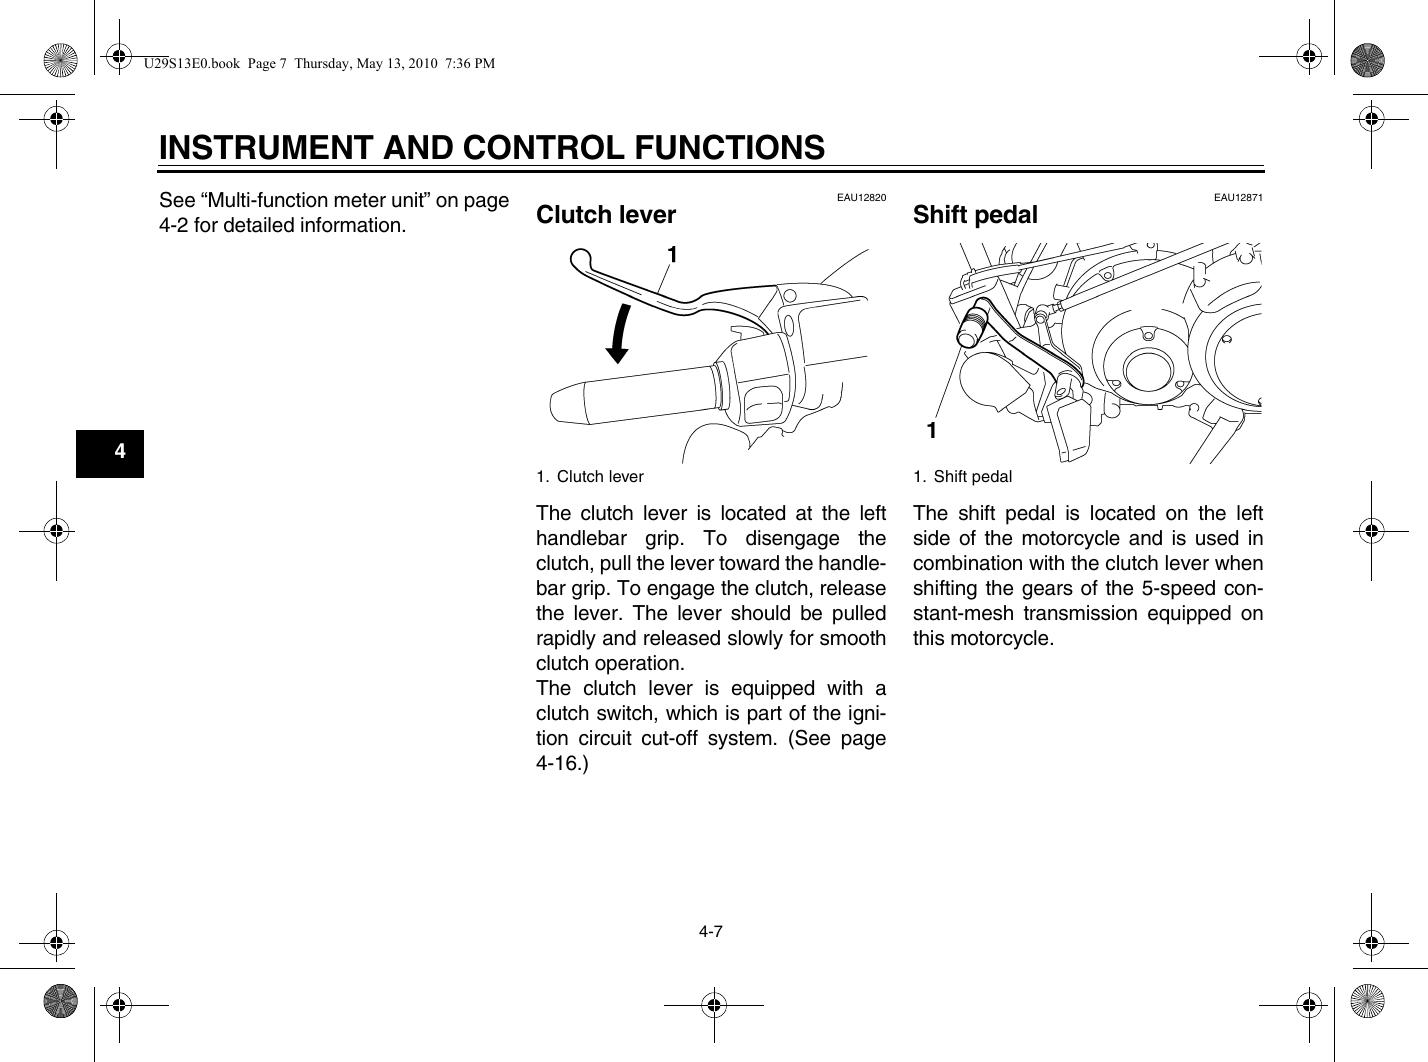 Yamaha 2011 Raider S Owners Manual